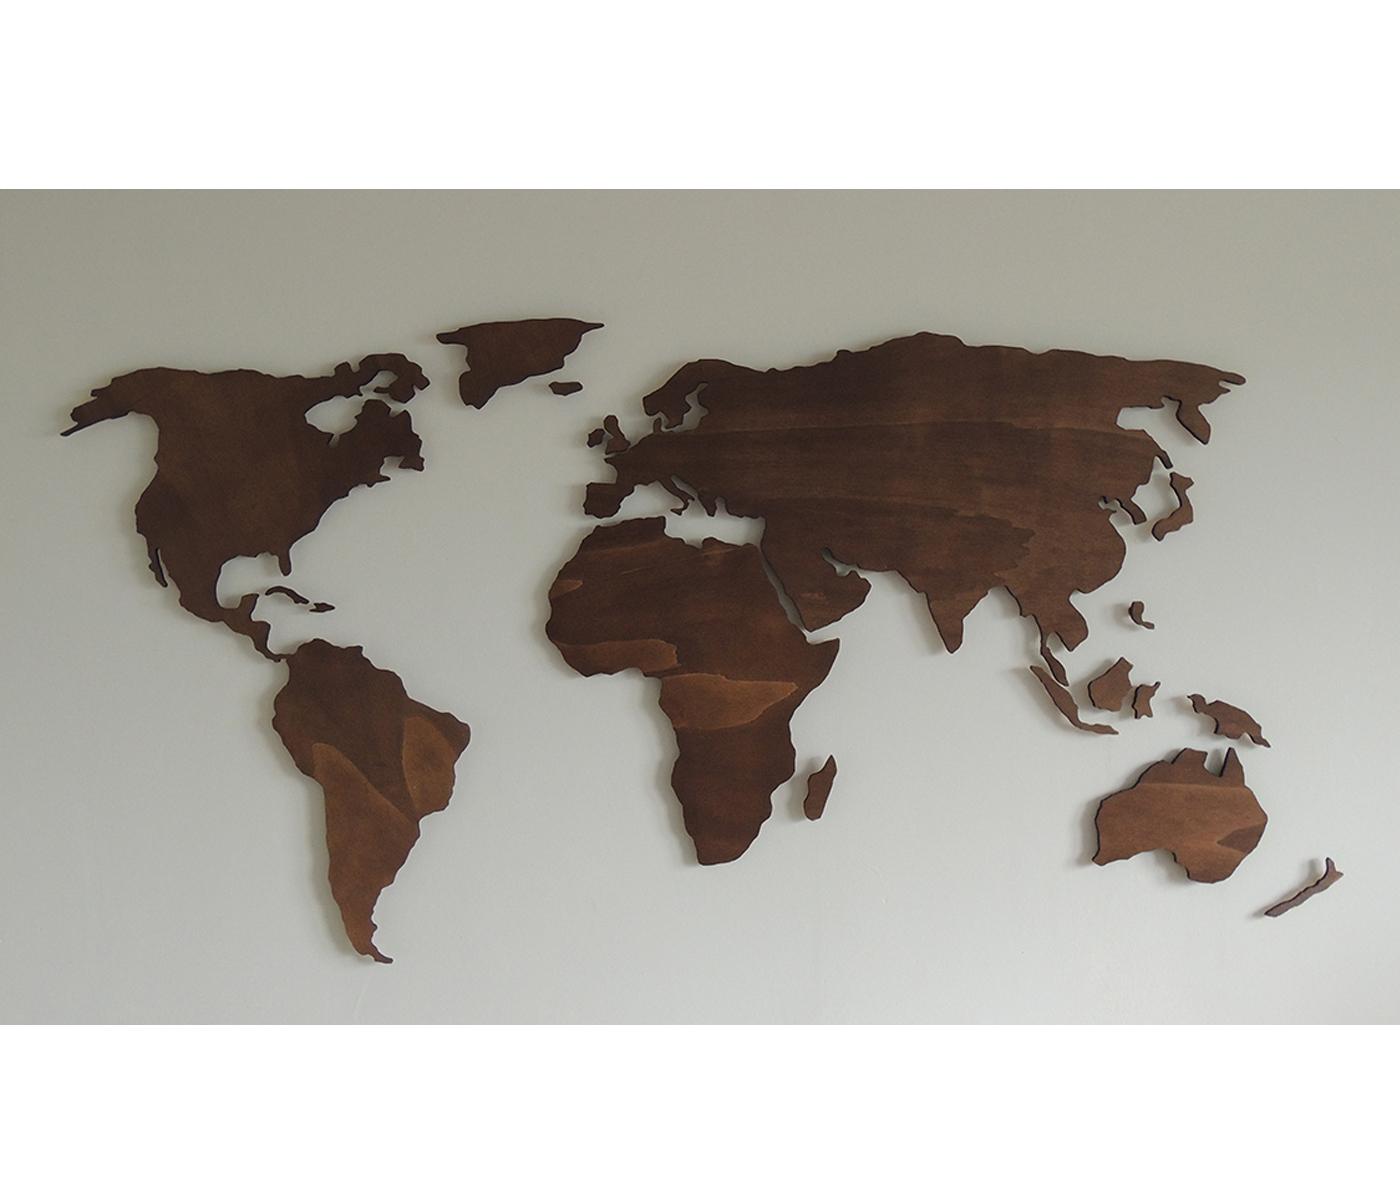 Wooden world map xl paspartoetpaspartoet wooden world map xl gumiabroncs Images